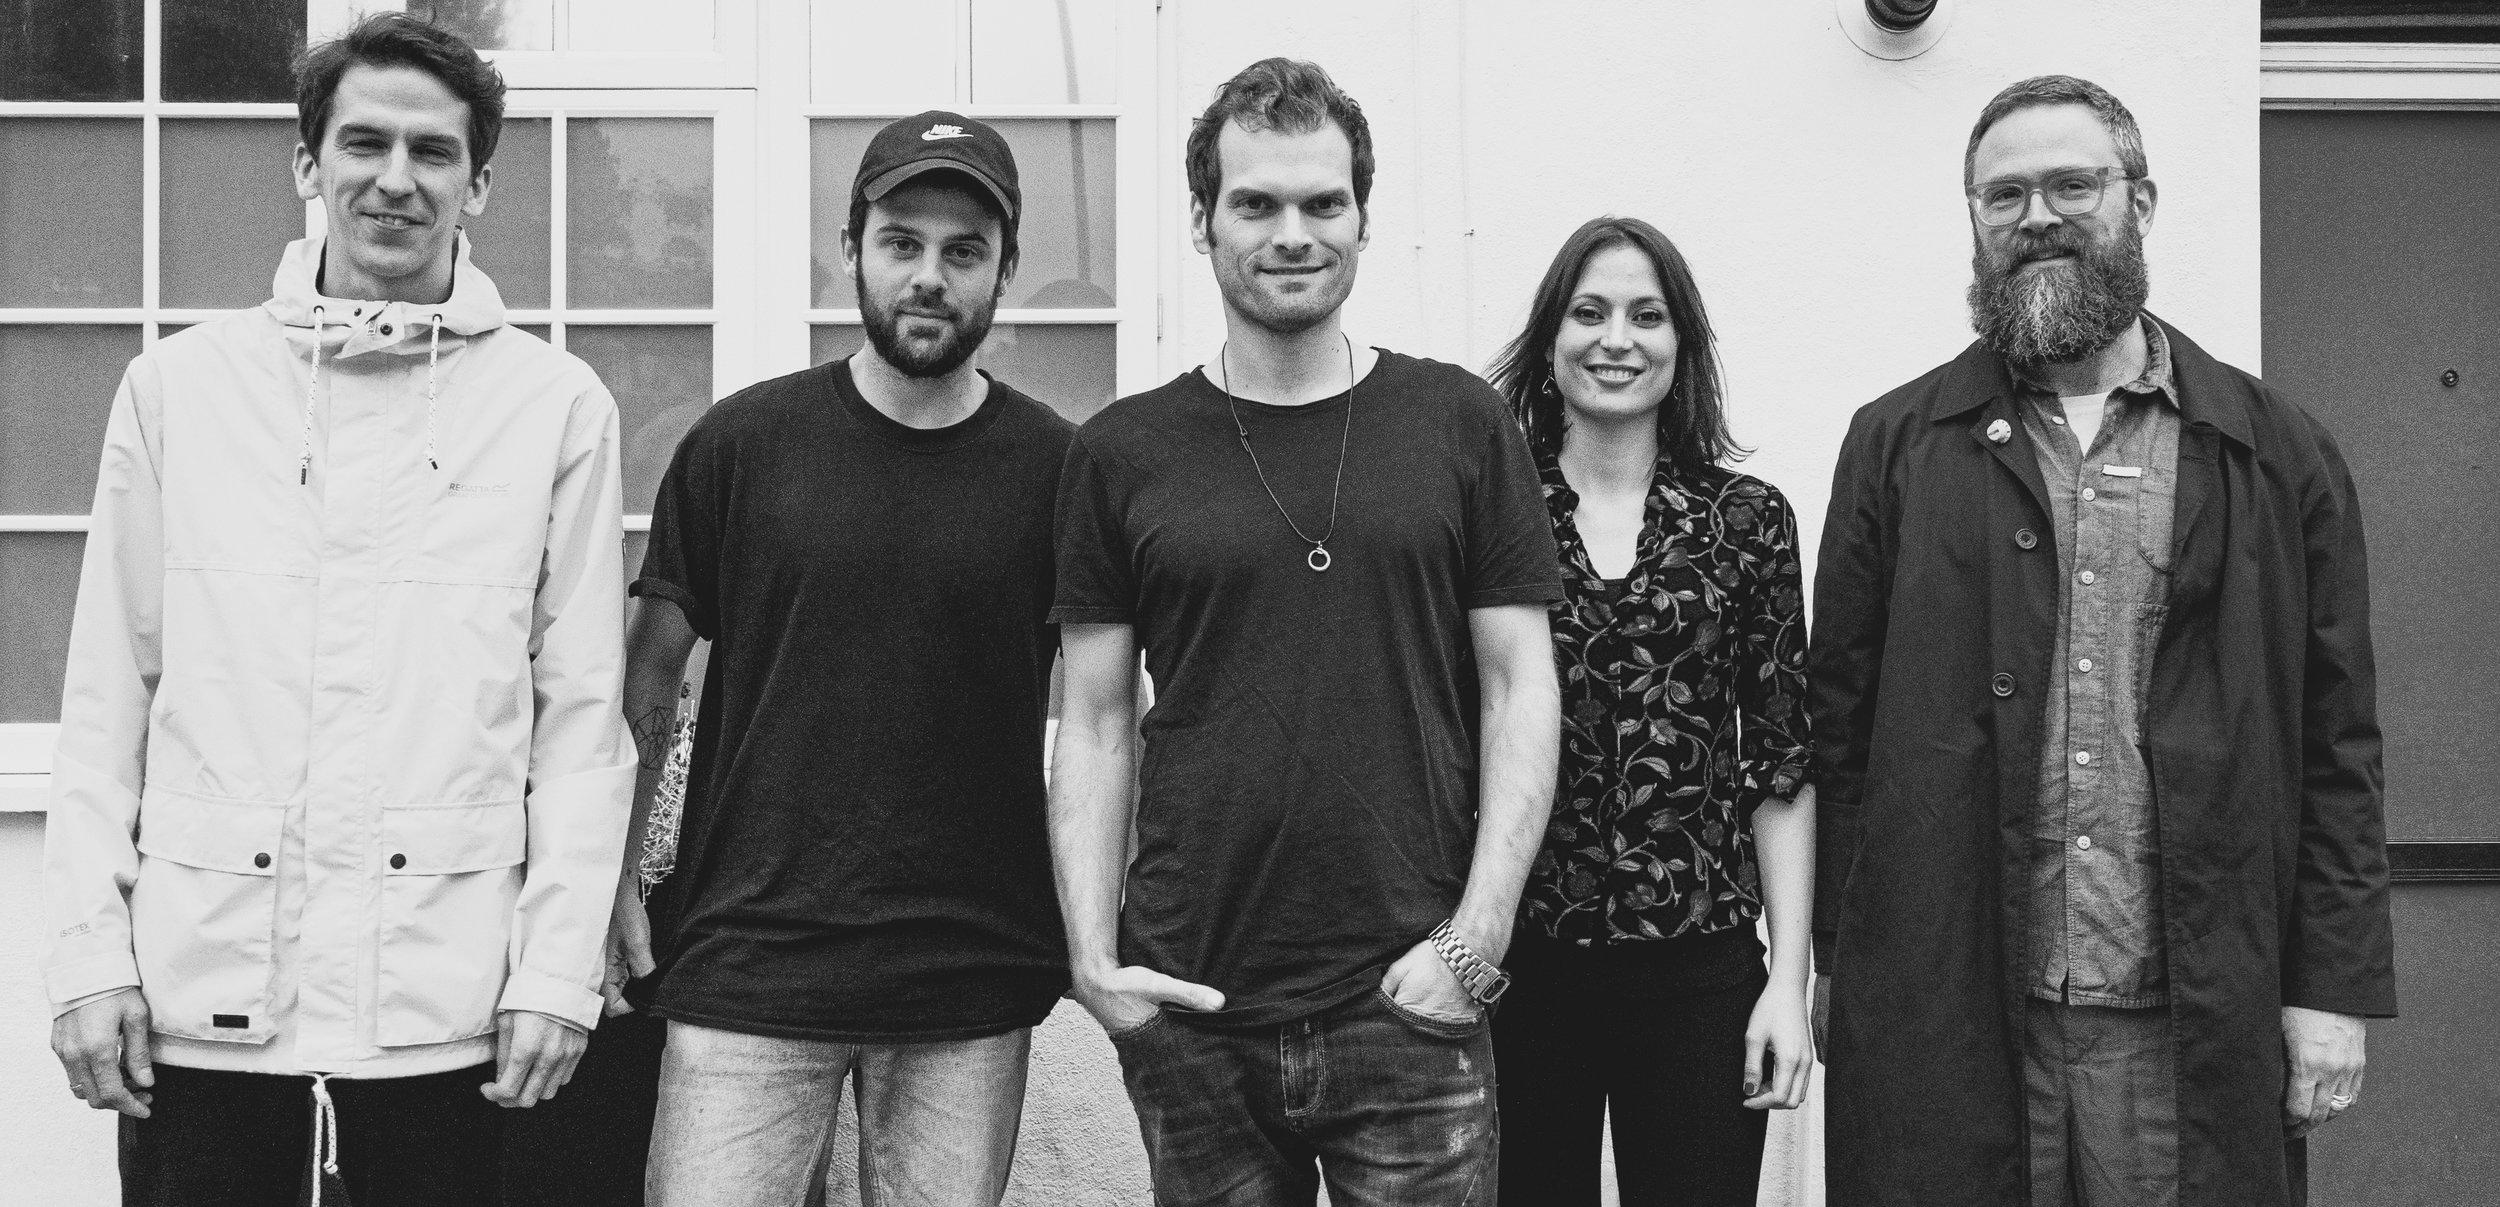 Graviton: Joshua Blackmore (drums), Josh Arcoleo (saxes), McCormack (keys), Noemi Nuti (vocals), Tom Herbert (bass)